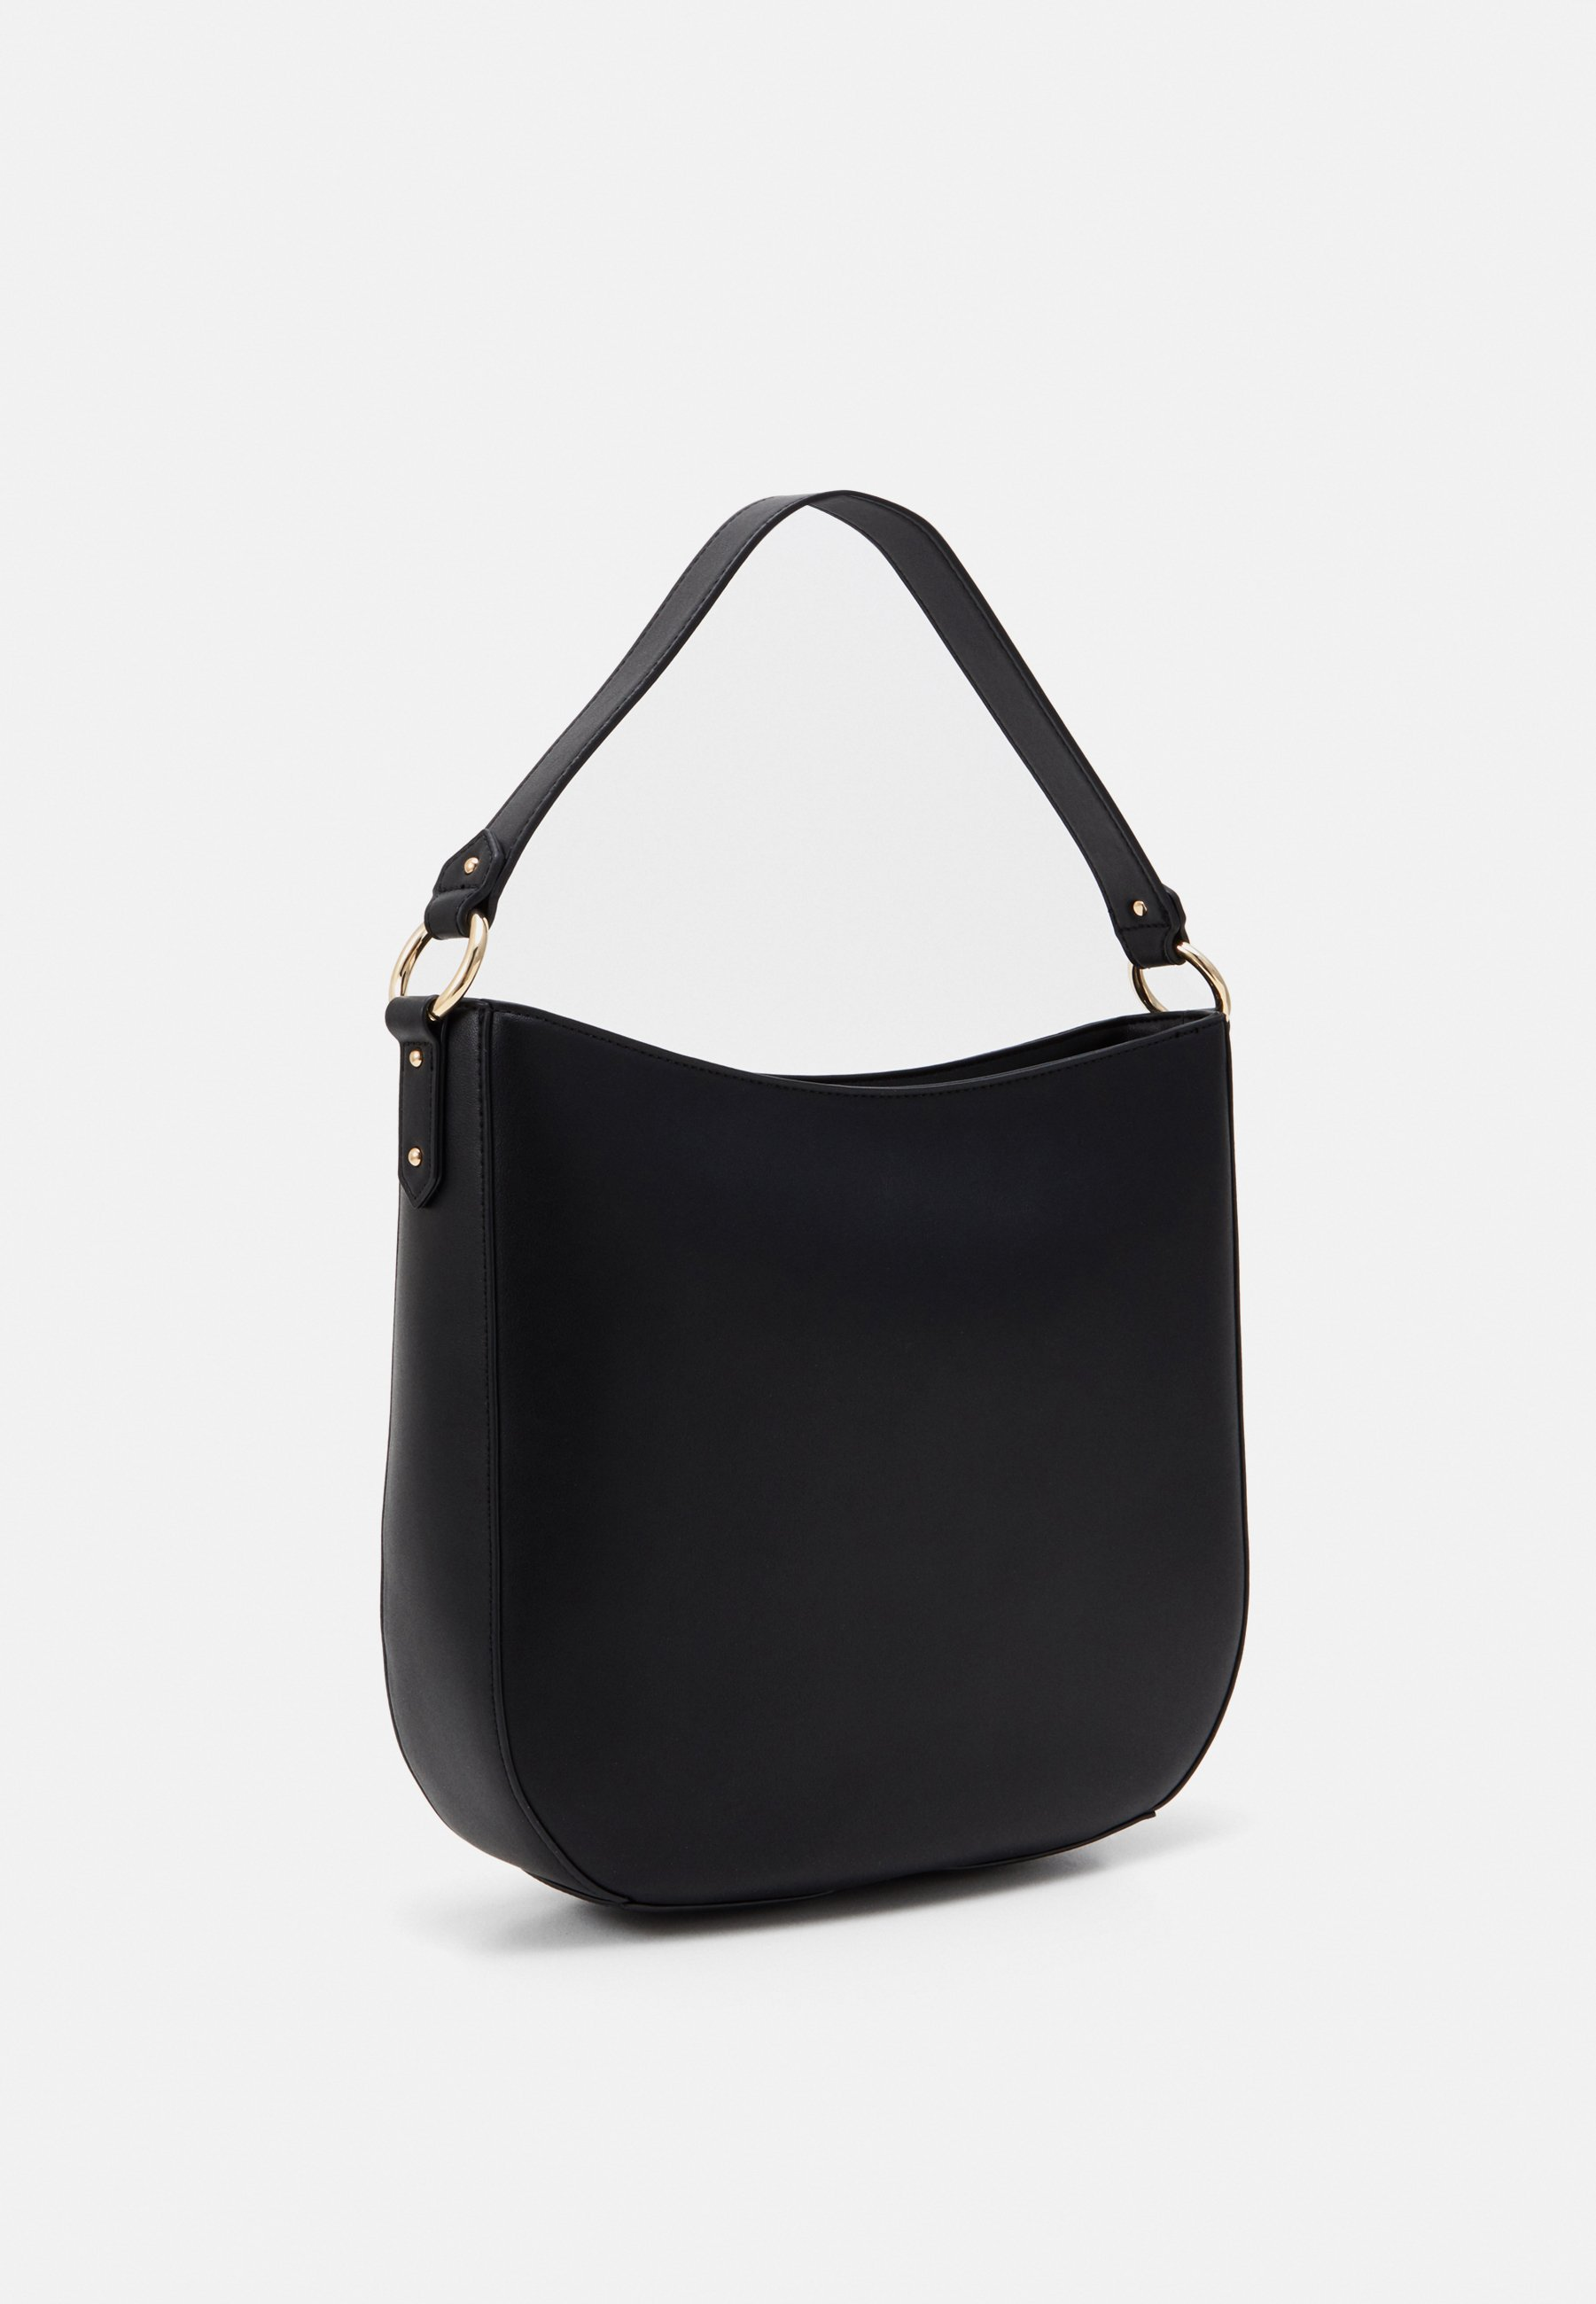 Trussardi Lisbona Shopper Logo - Shopping Bag Black/schwarz